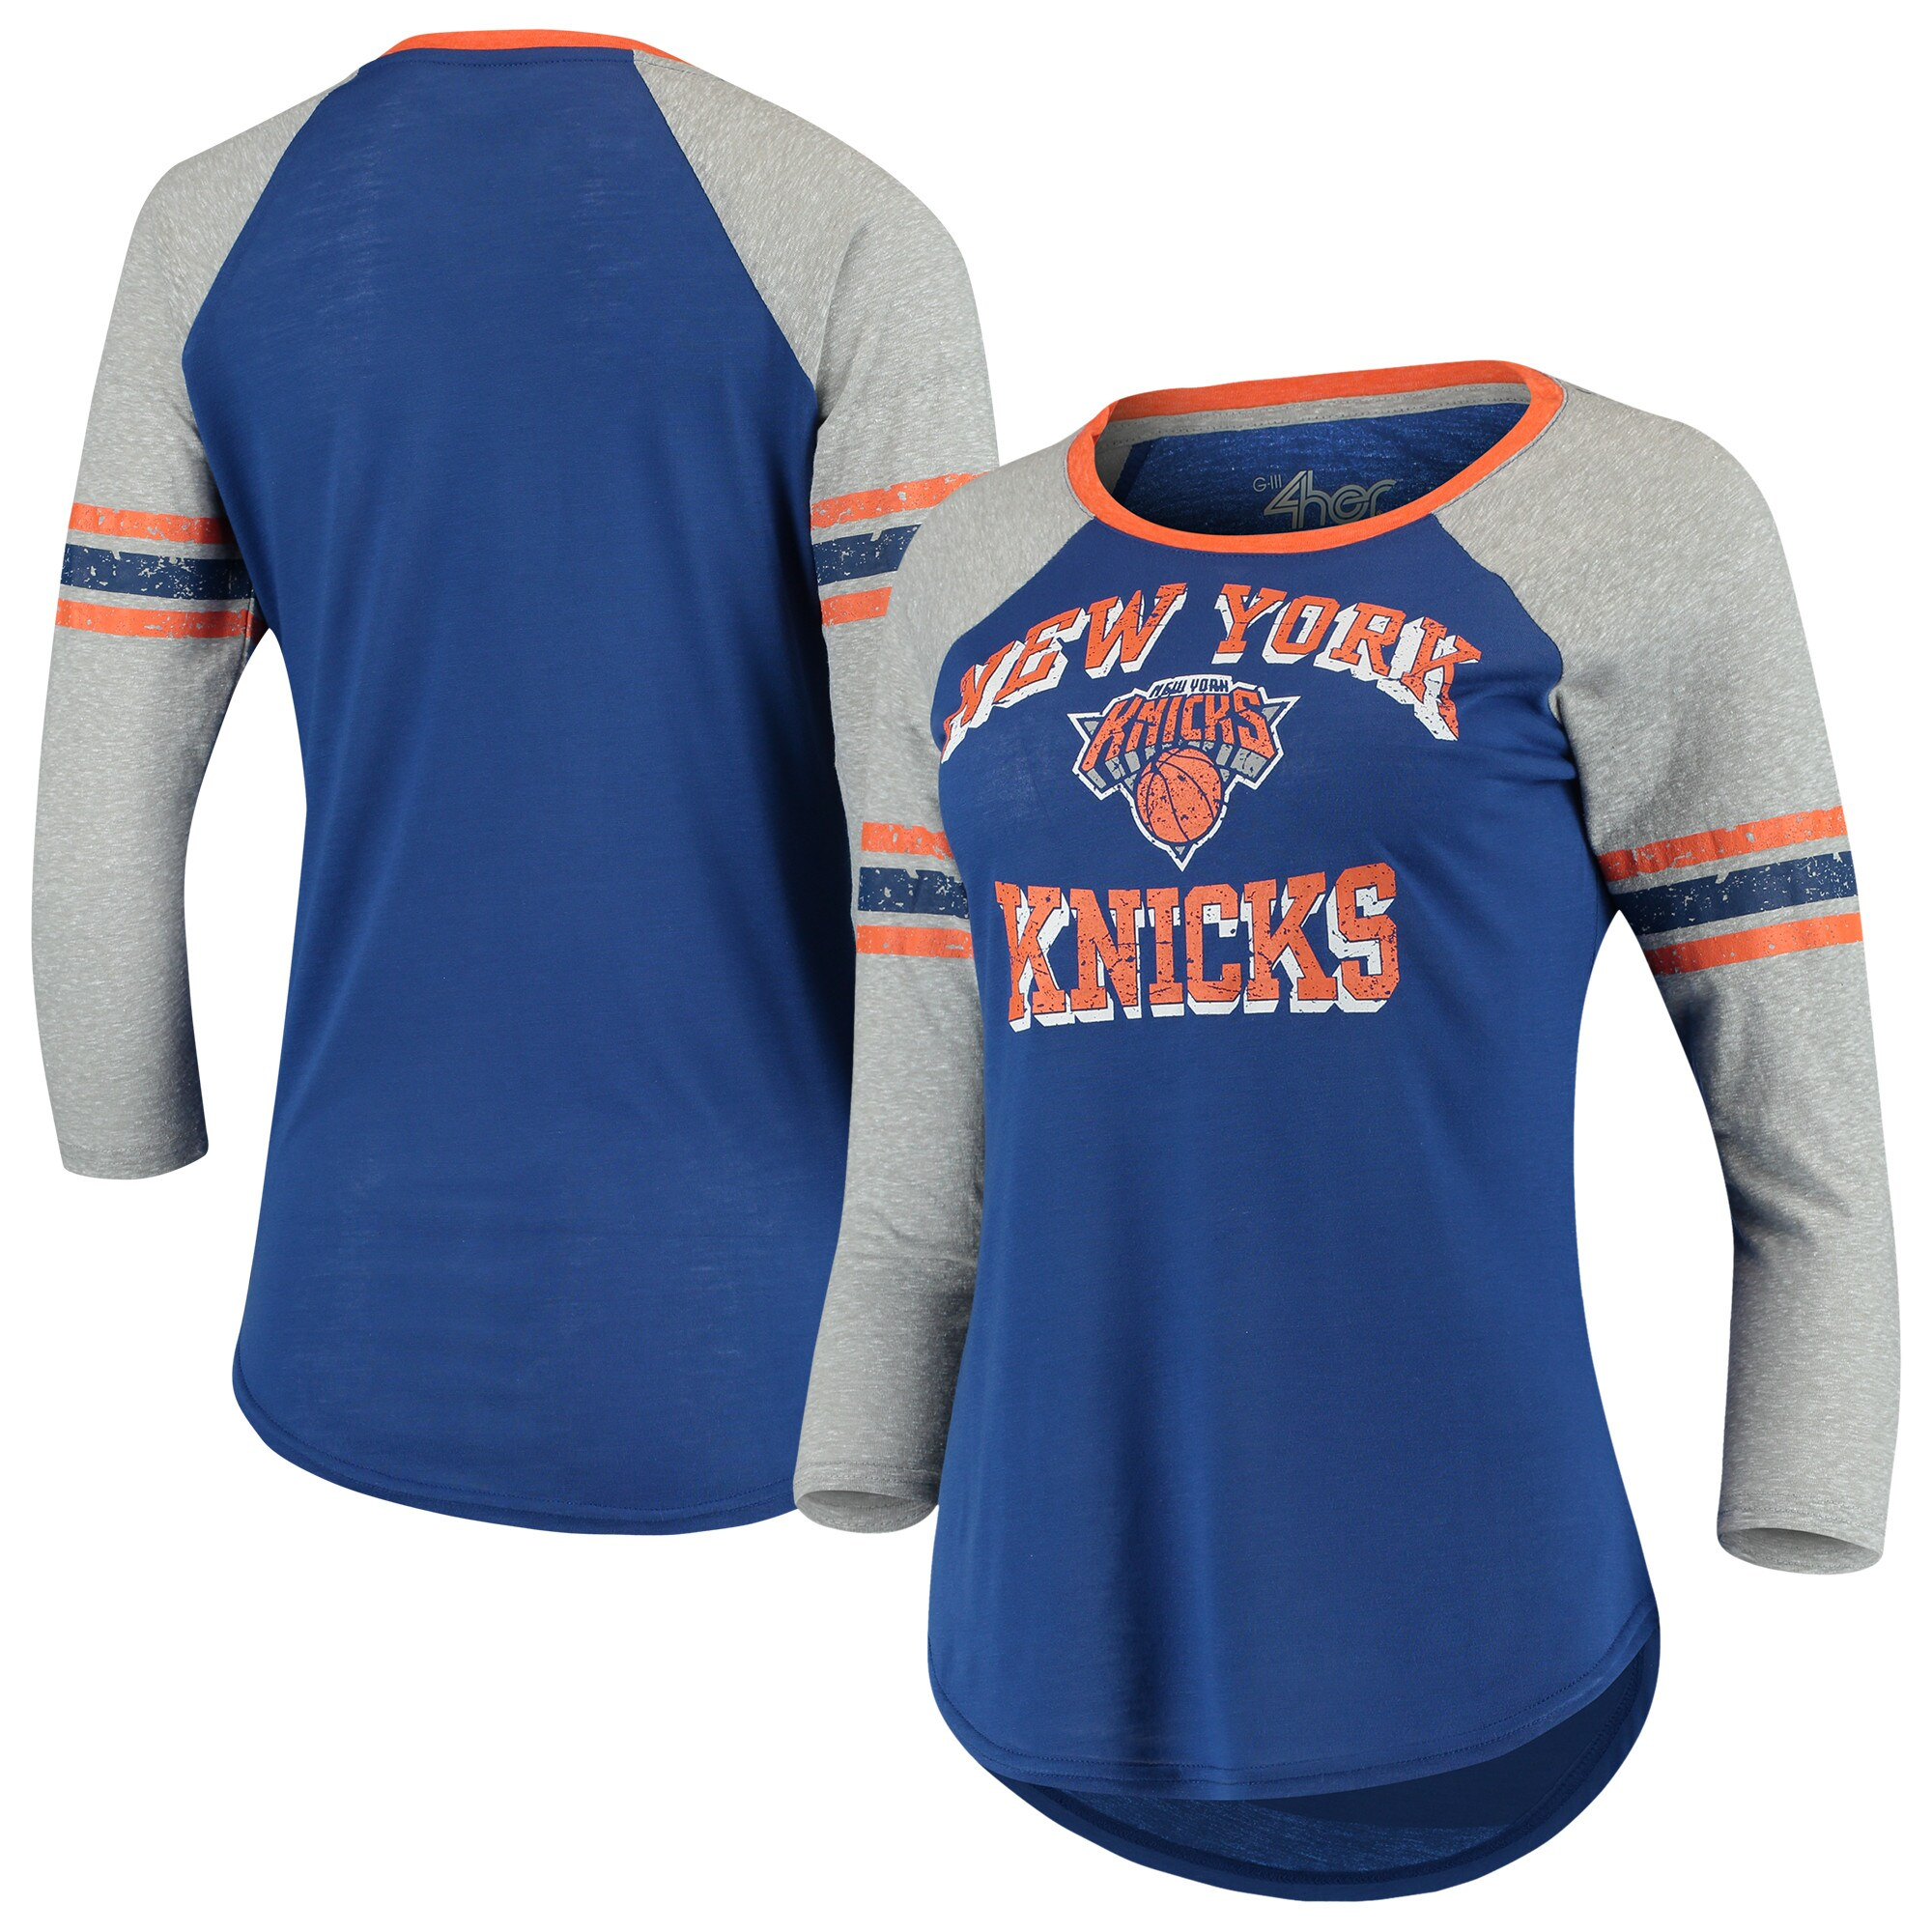 New York Knicks G-III 4Her by Carl Banks Women's The Court Tri-Blend Raglan 3/4-Sleeve T-Shirt - Blue/Heathered Gray